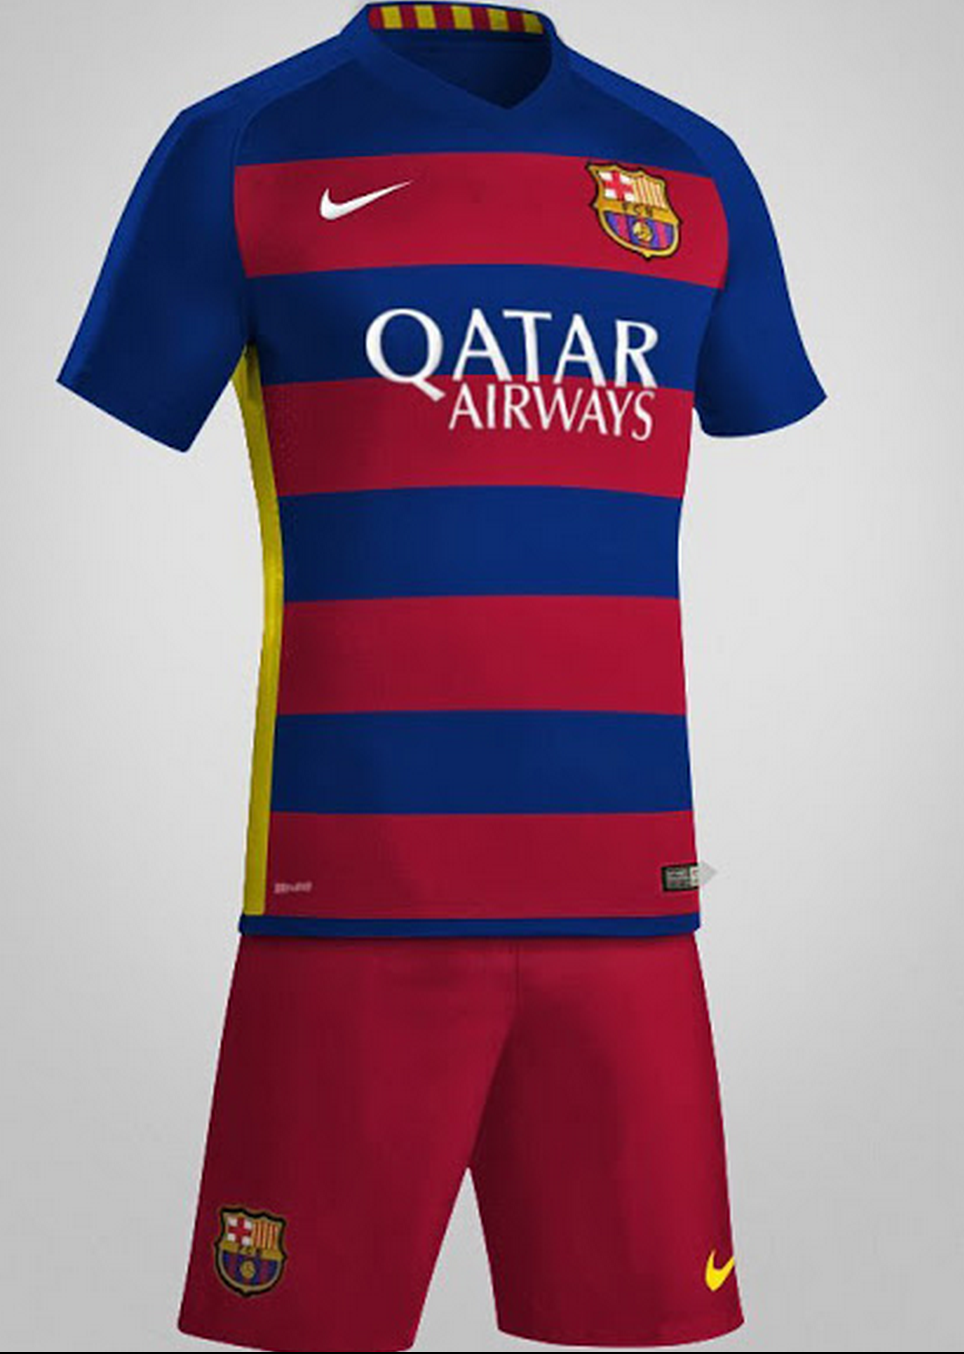 622fc9b664636 camiseta F. C. barcelona 2016